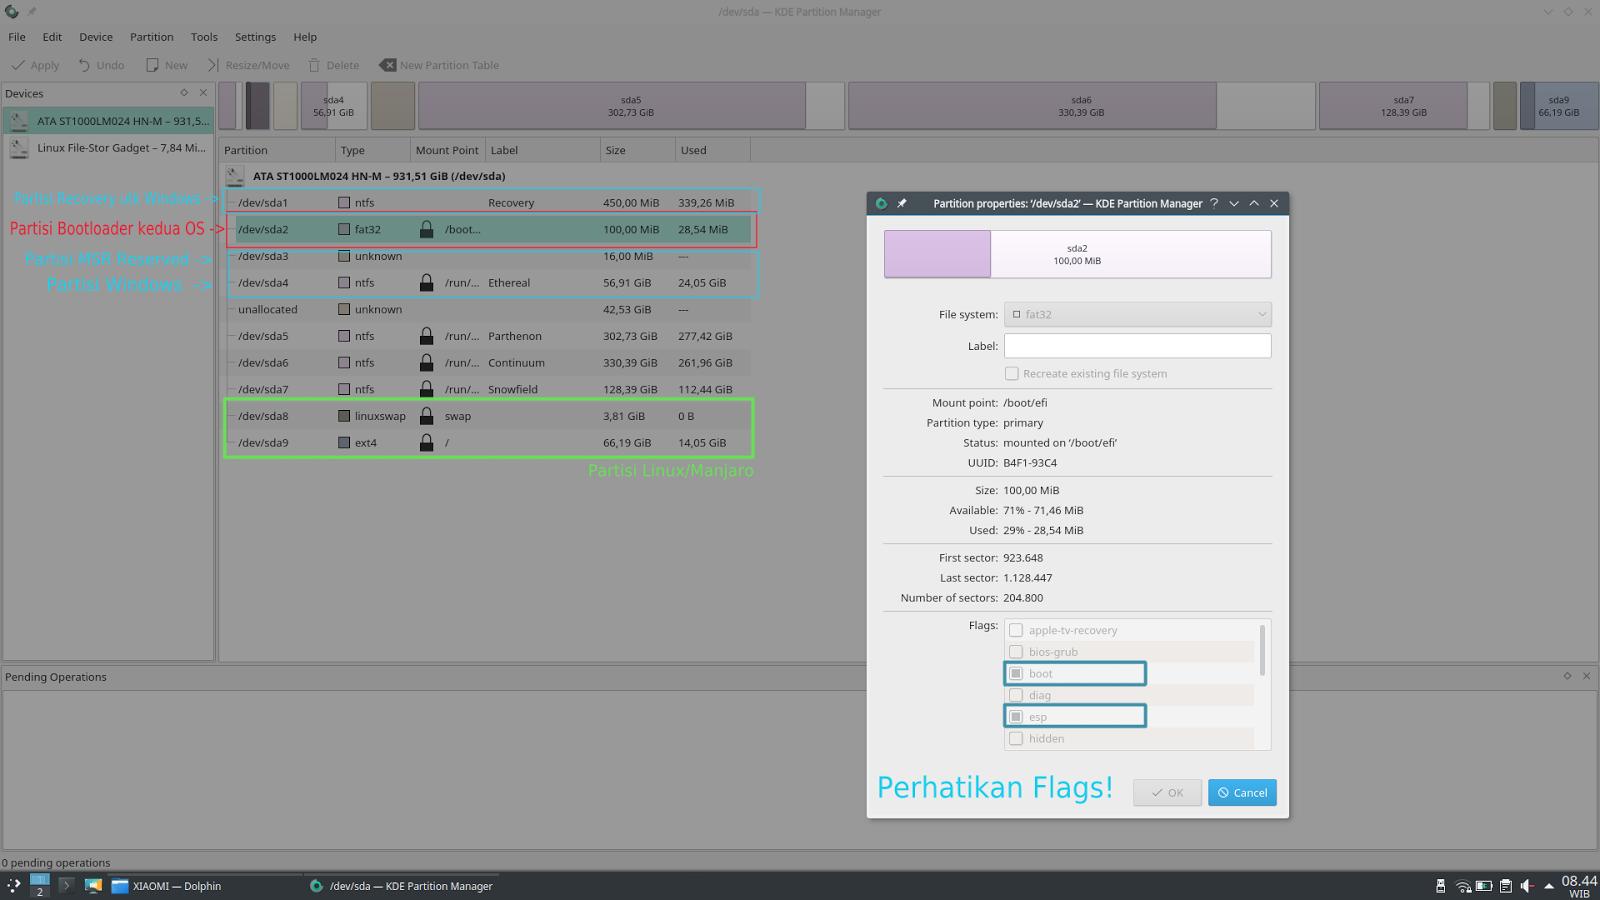 Tips Dual Boot Manjaro 17 0 1 Gellivara dengan Windows 10 (GPT/MBR